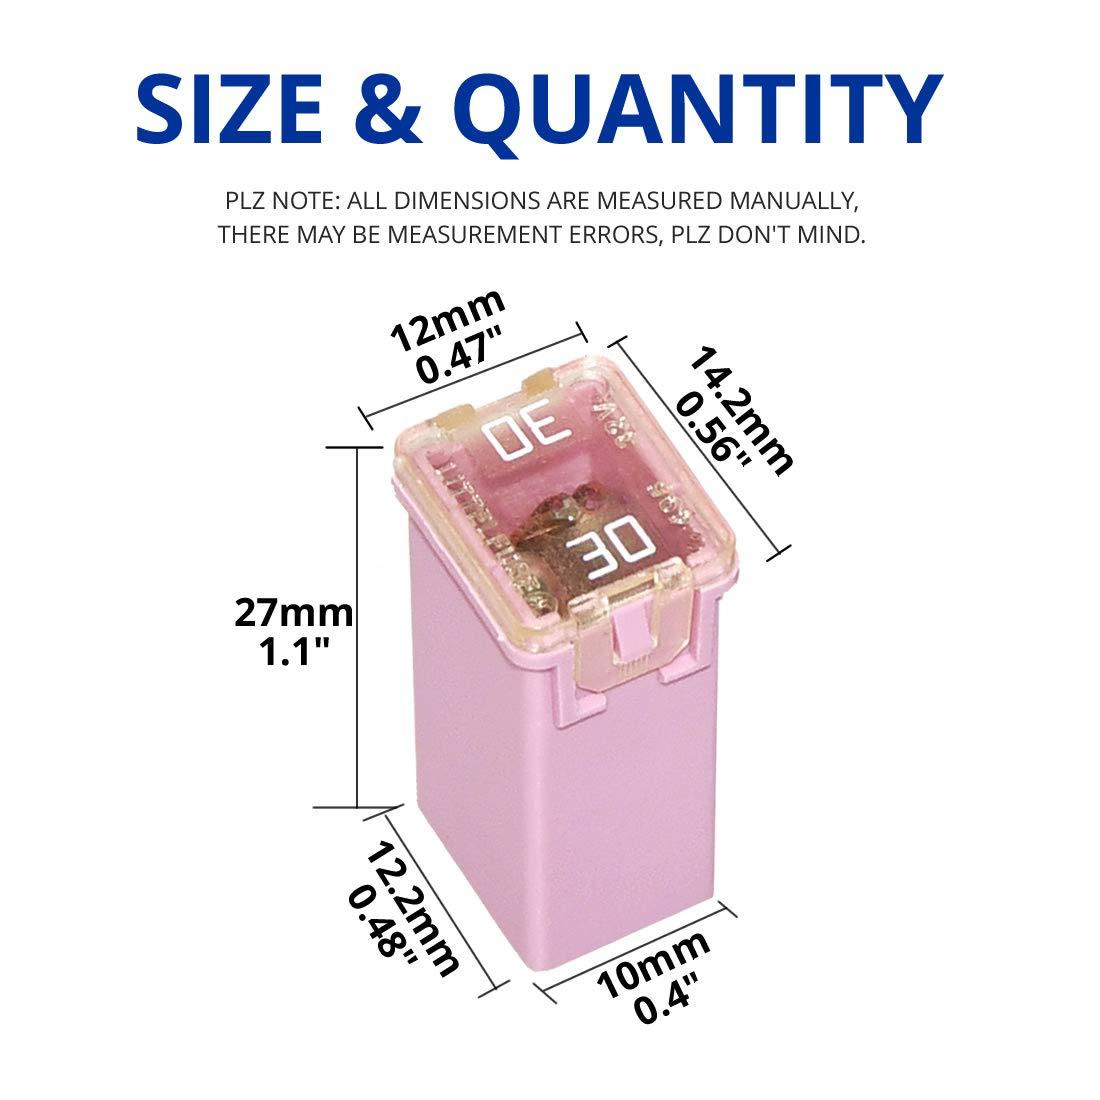 Fuse Assortments 36 pc Mini Jcase Fuse Assortment HIGH PROFILE 30A ...